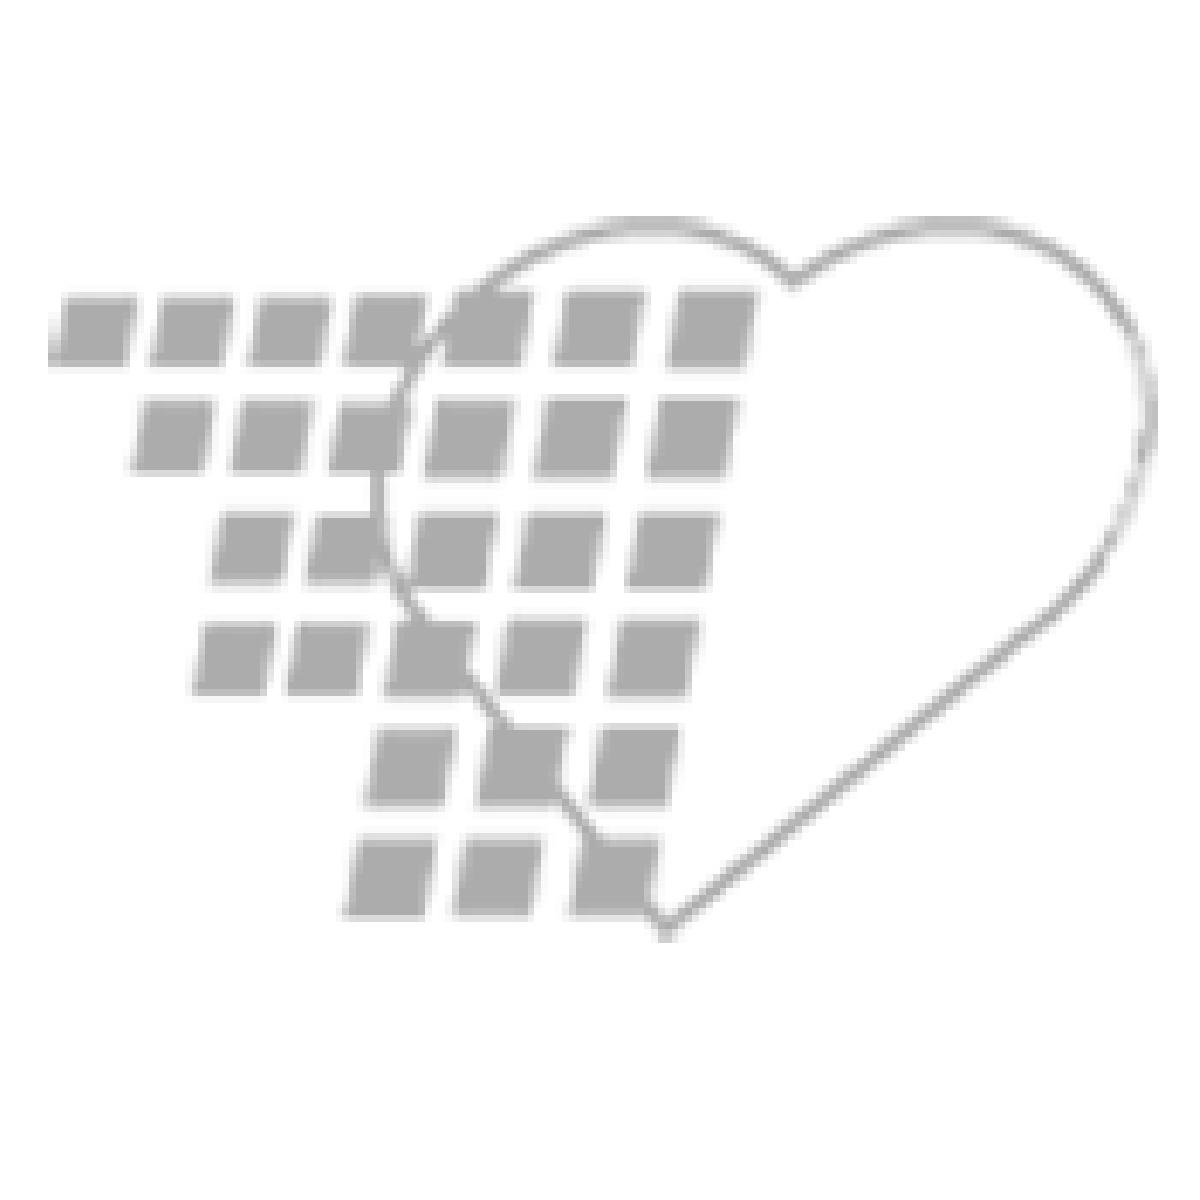 06-54-8015-REFURB Refurbished Alaris Medley 8015 Infusion Pump